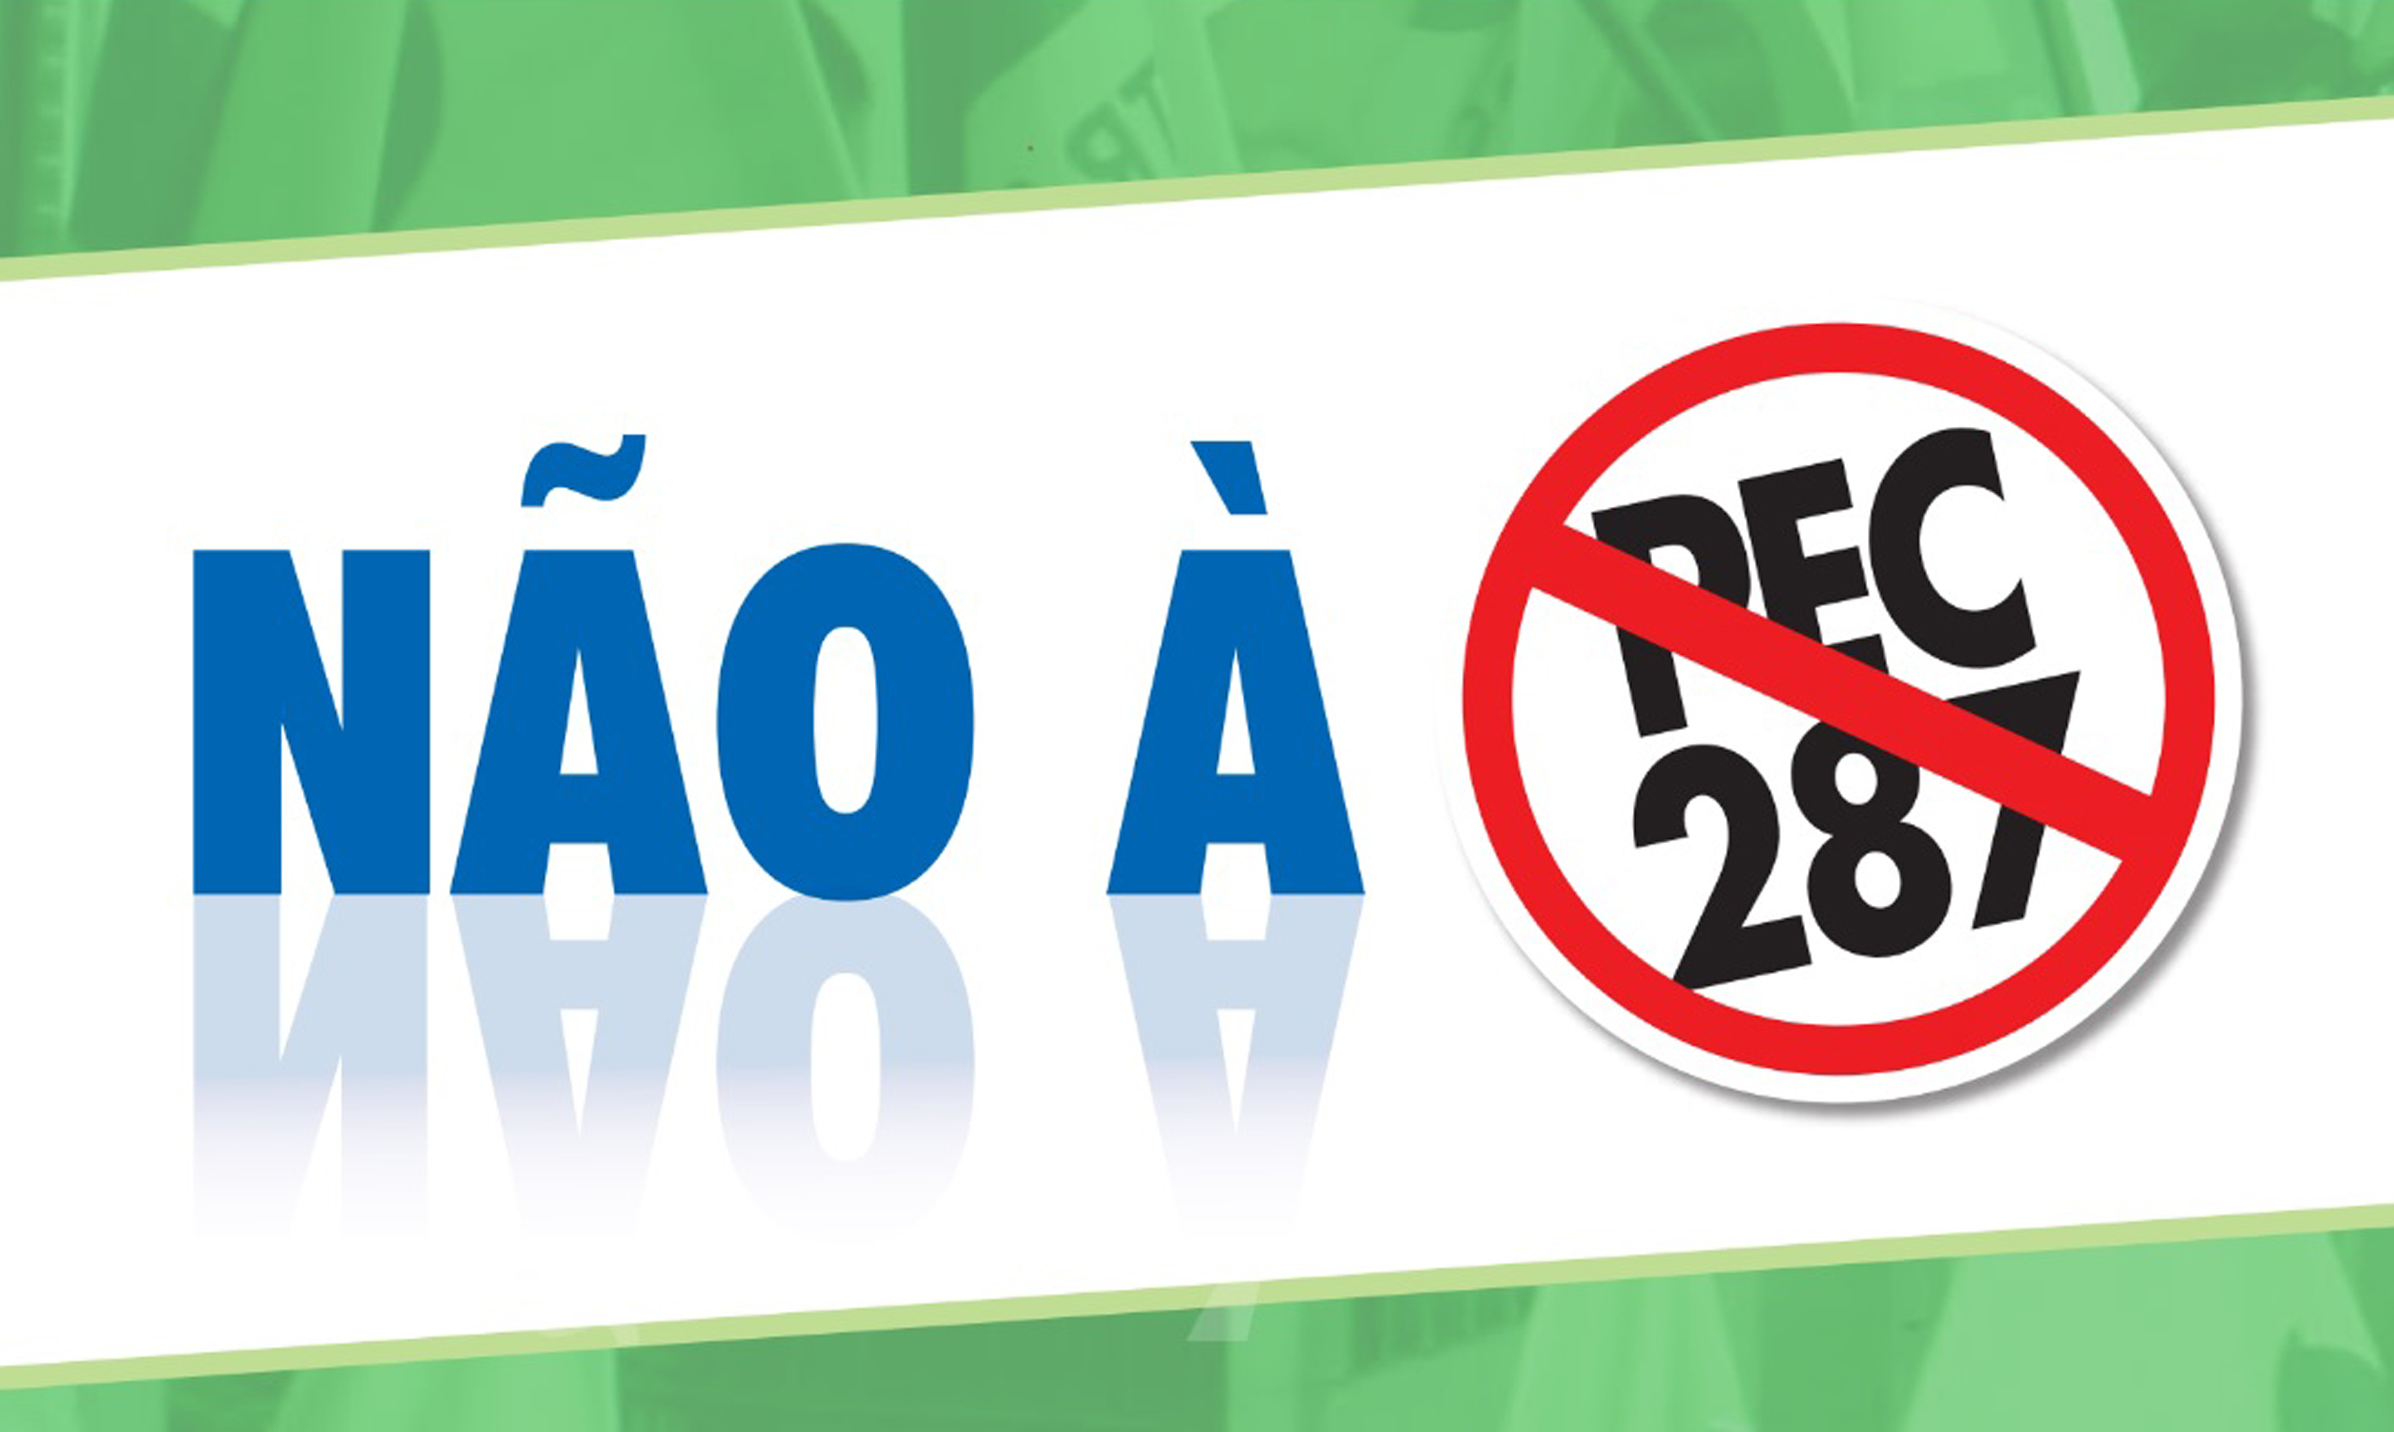 CSB disponibiliza panfleto contra a Reforma da Previdência